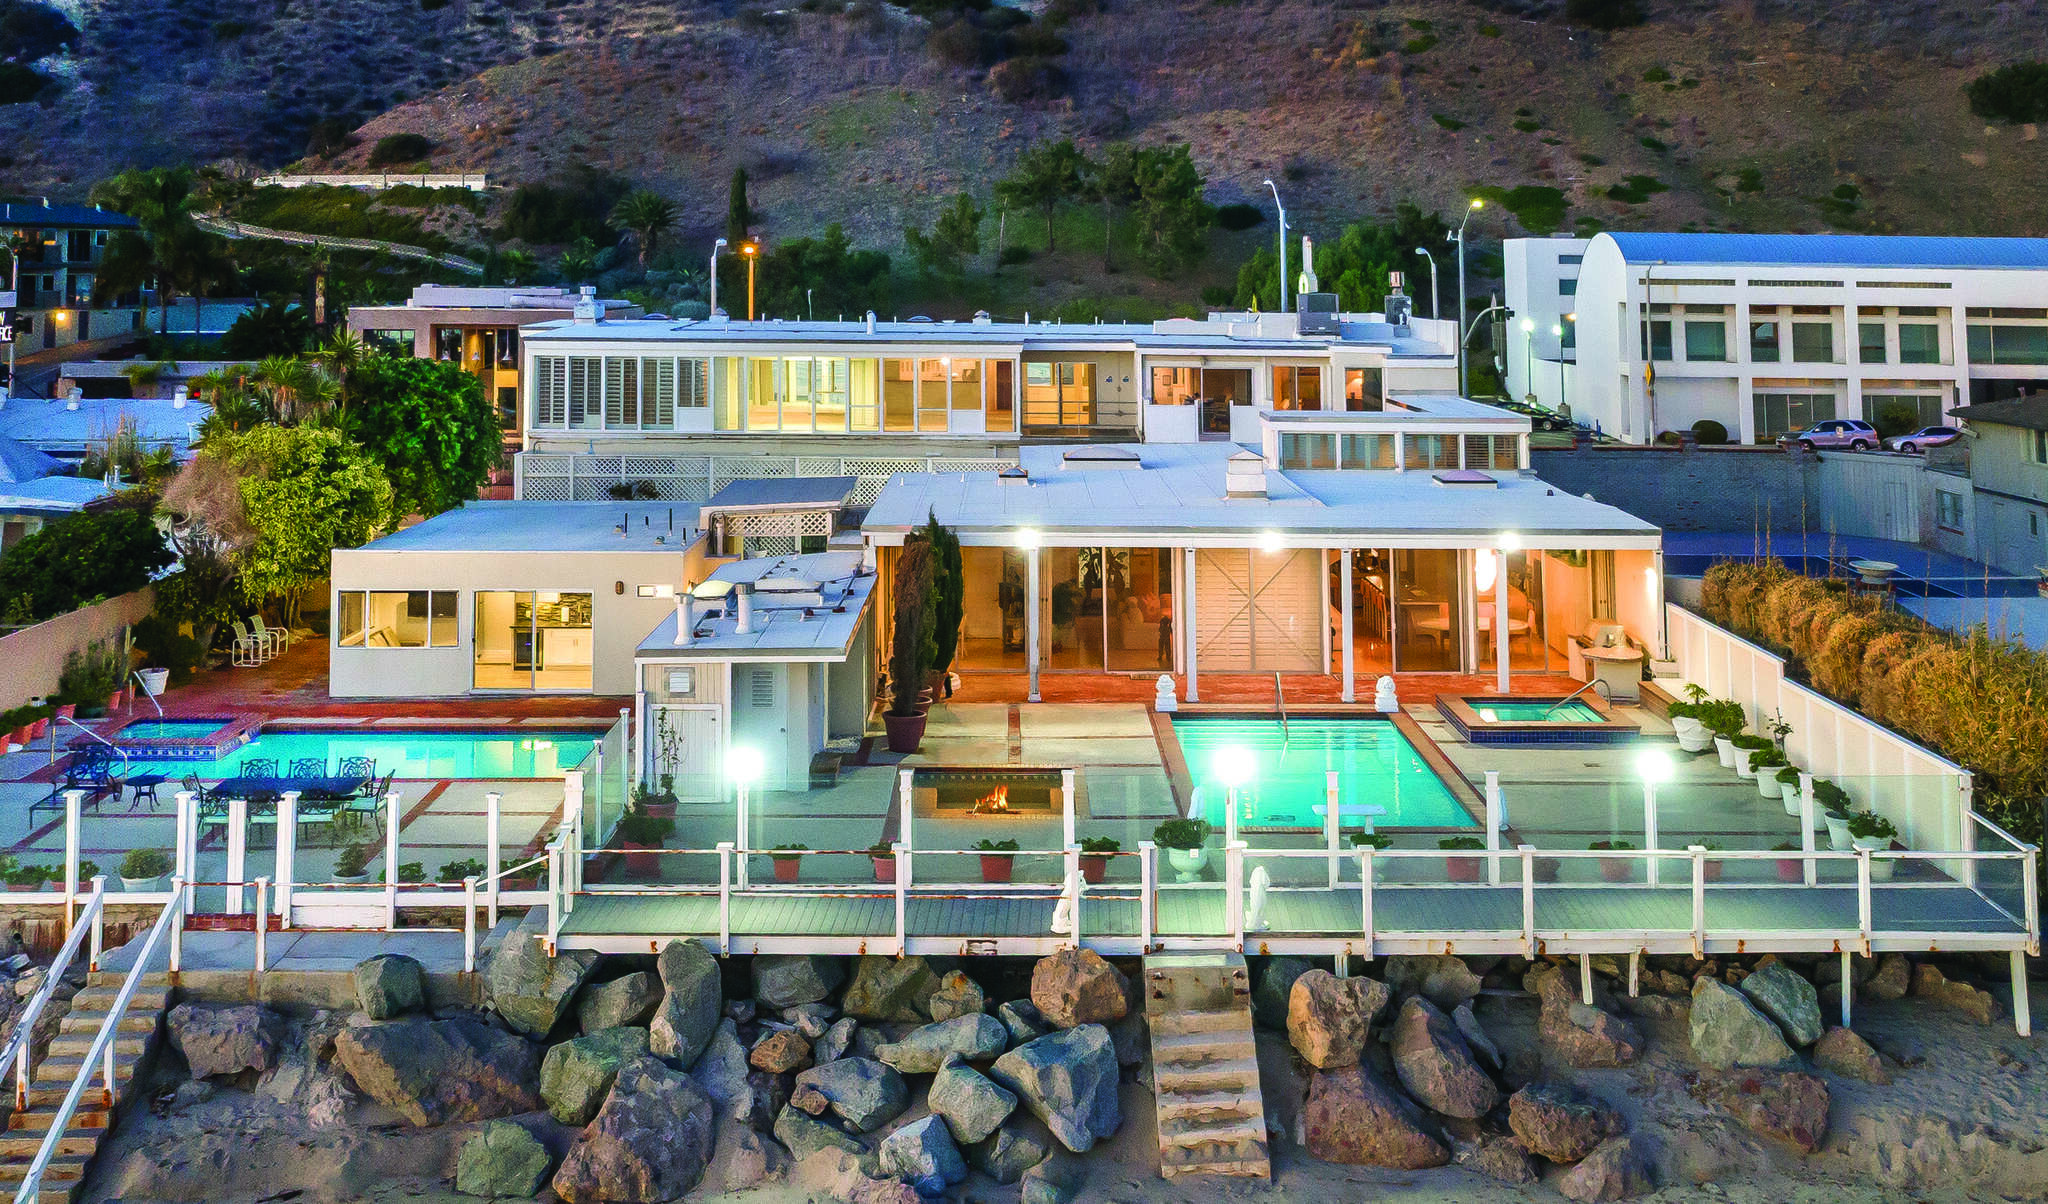 Single Family for Sale at 22522 Pacific Coast Hwy Malibu, California 90265 United States